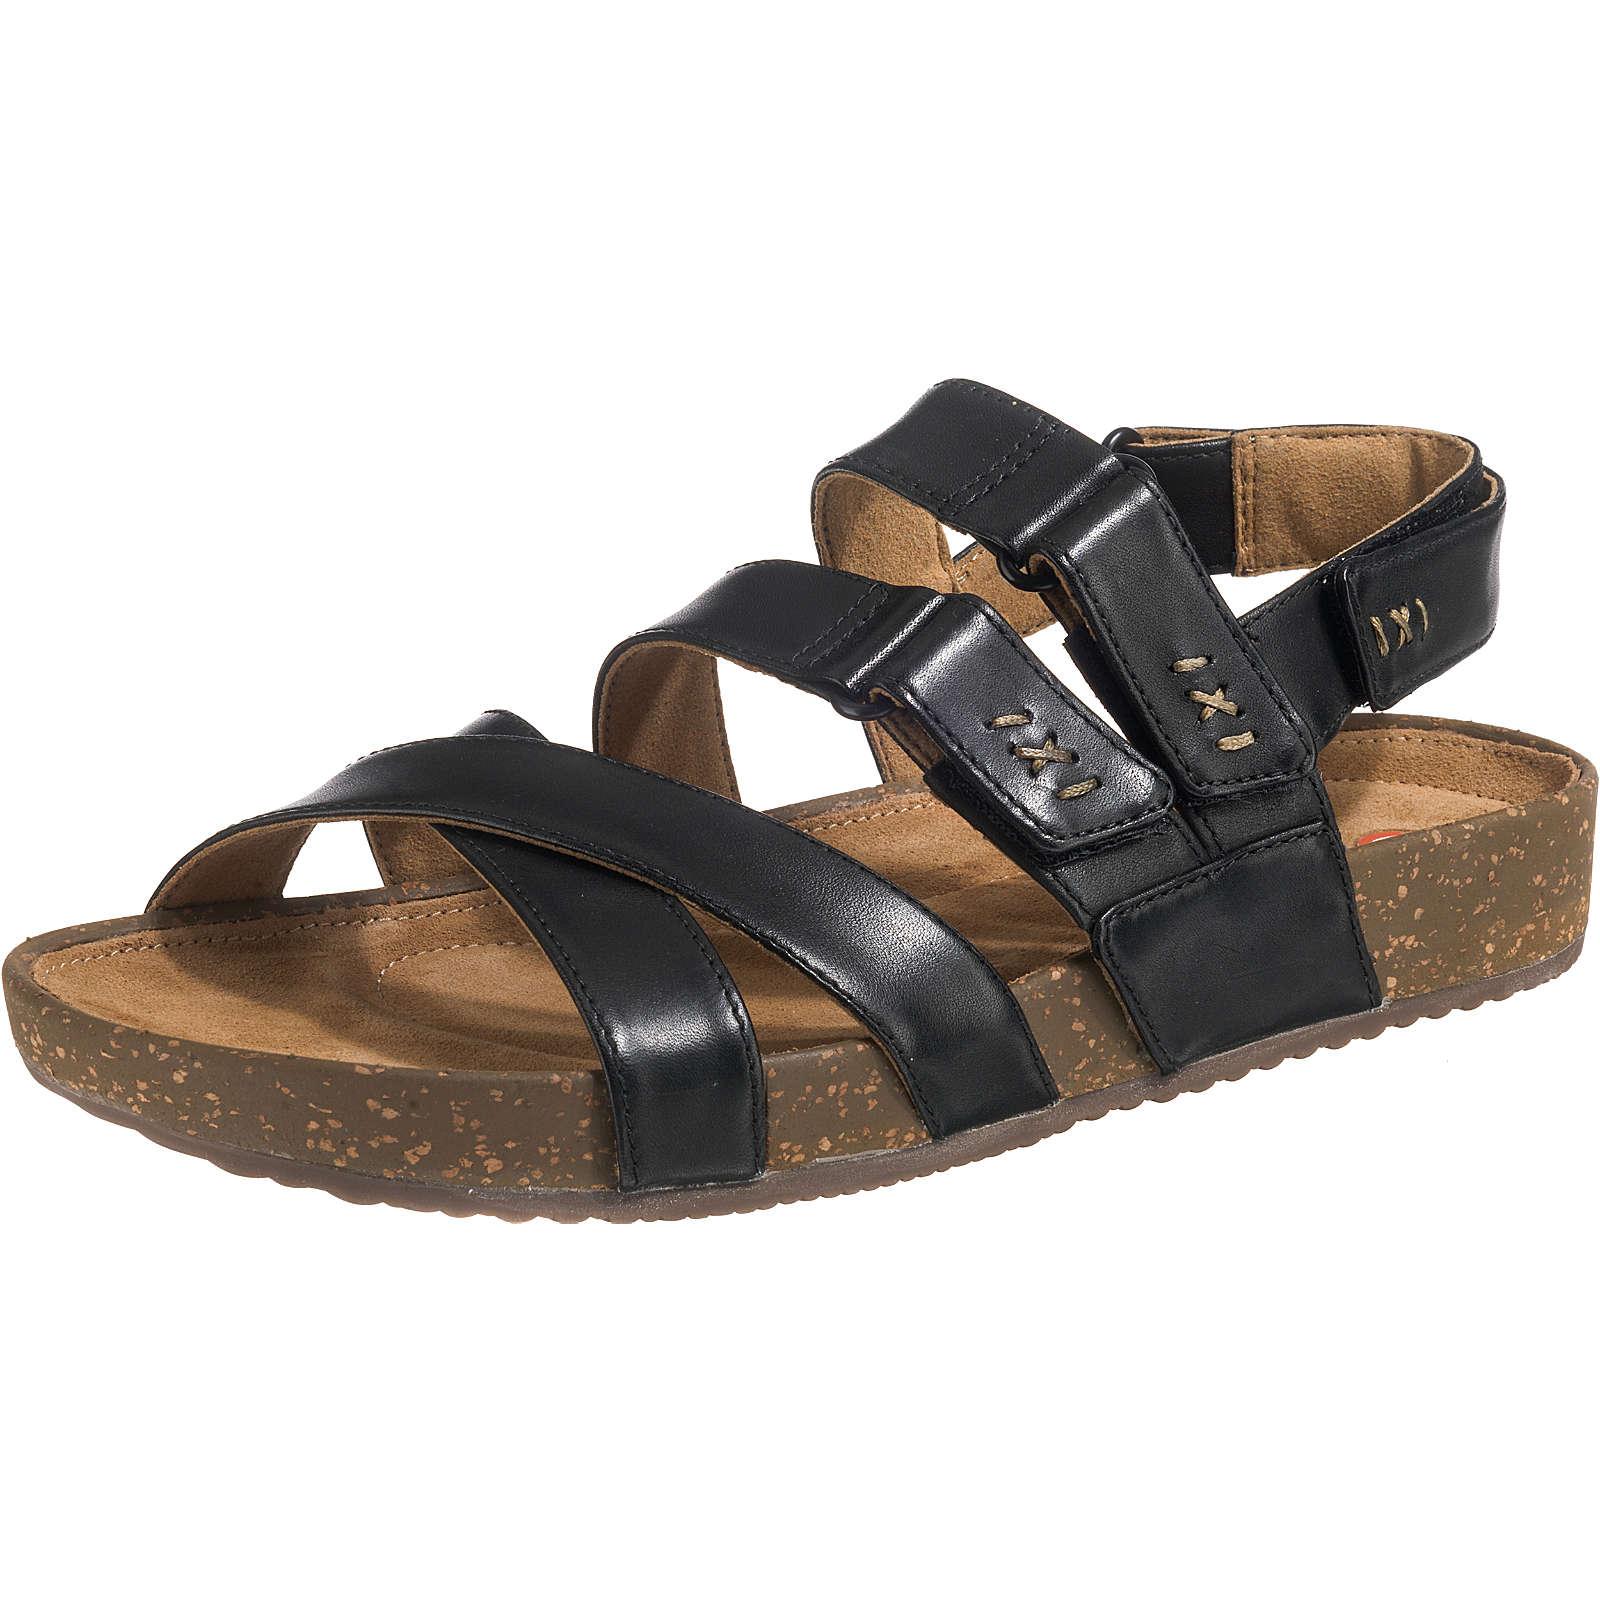 Clarks RosillaKeene Komfort-Sandalen schwarz Damen Gr. 39